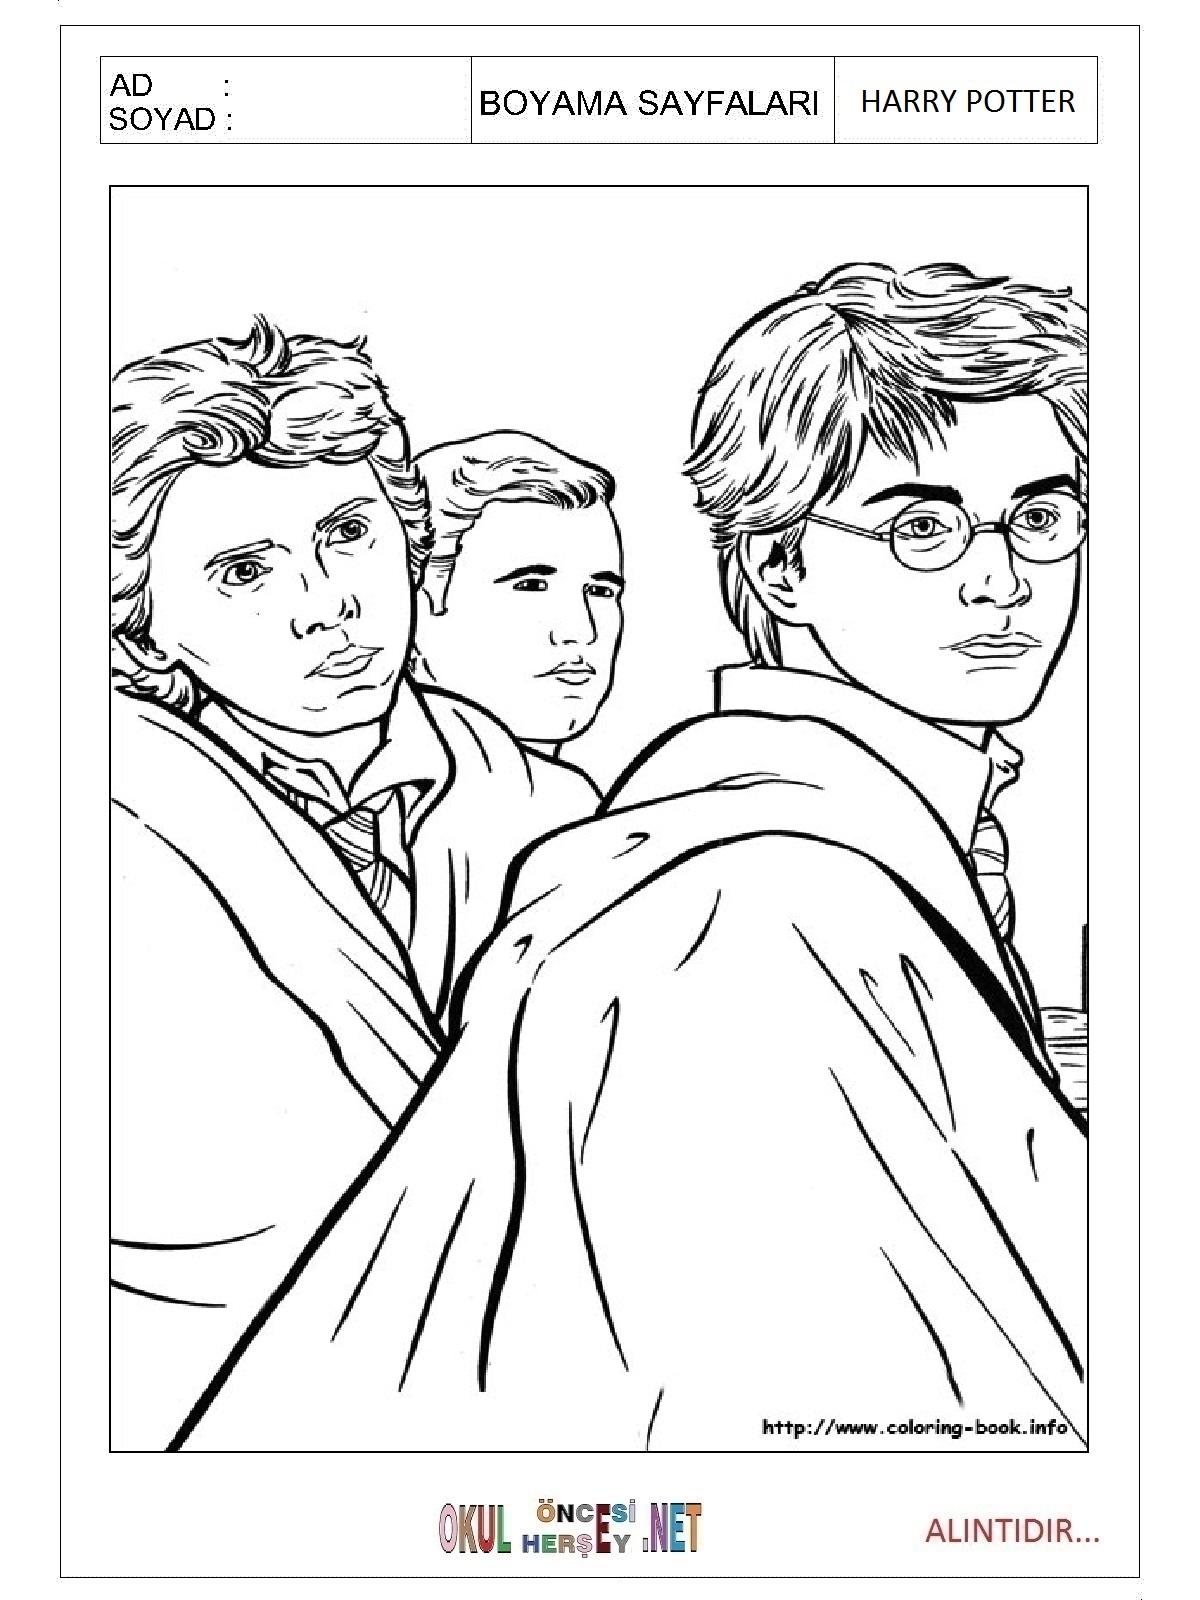 Harry Potter Boyama Sayfalari